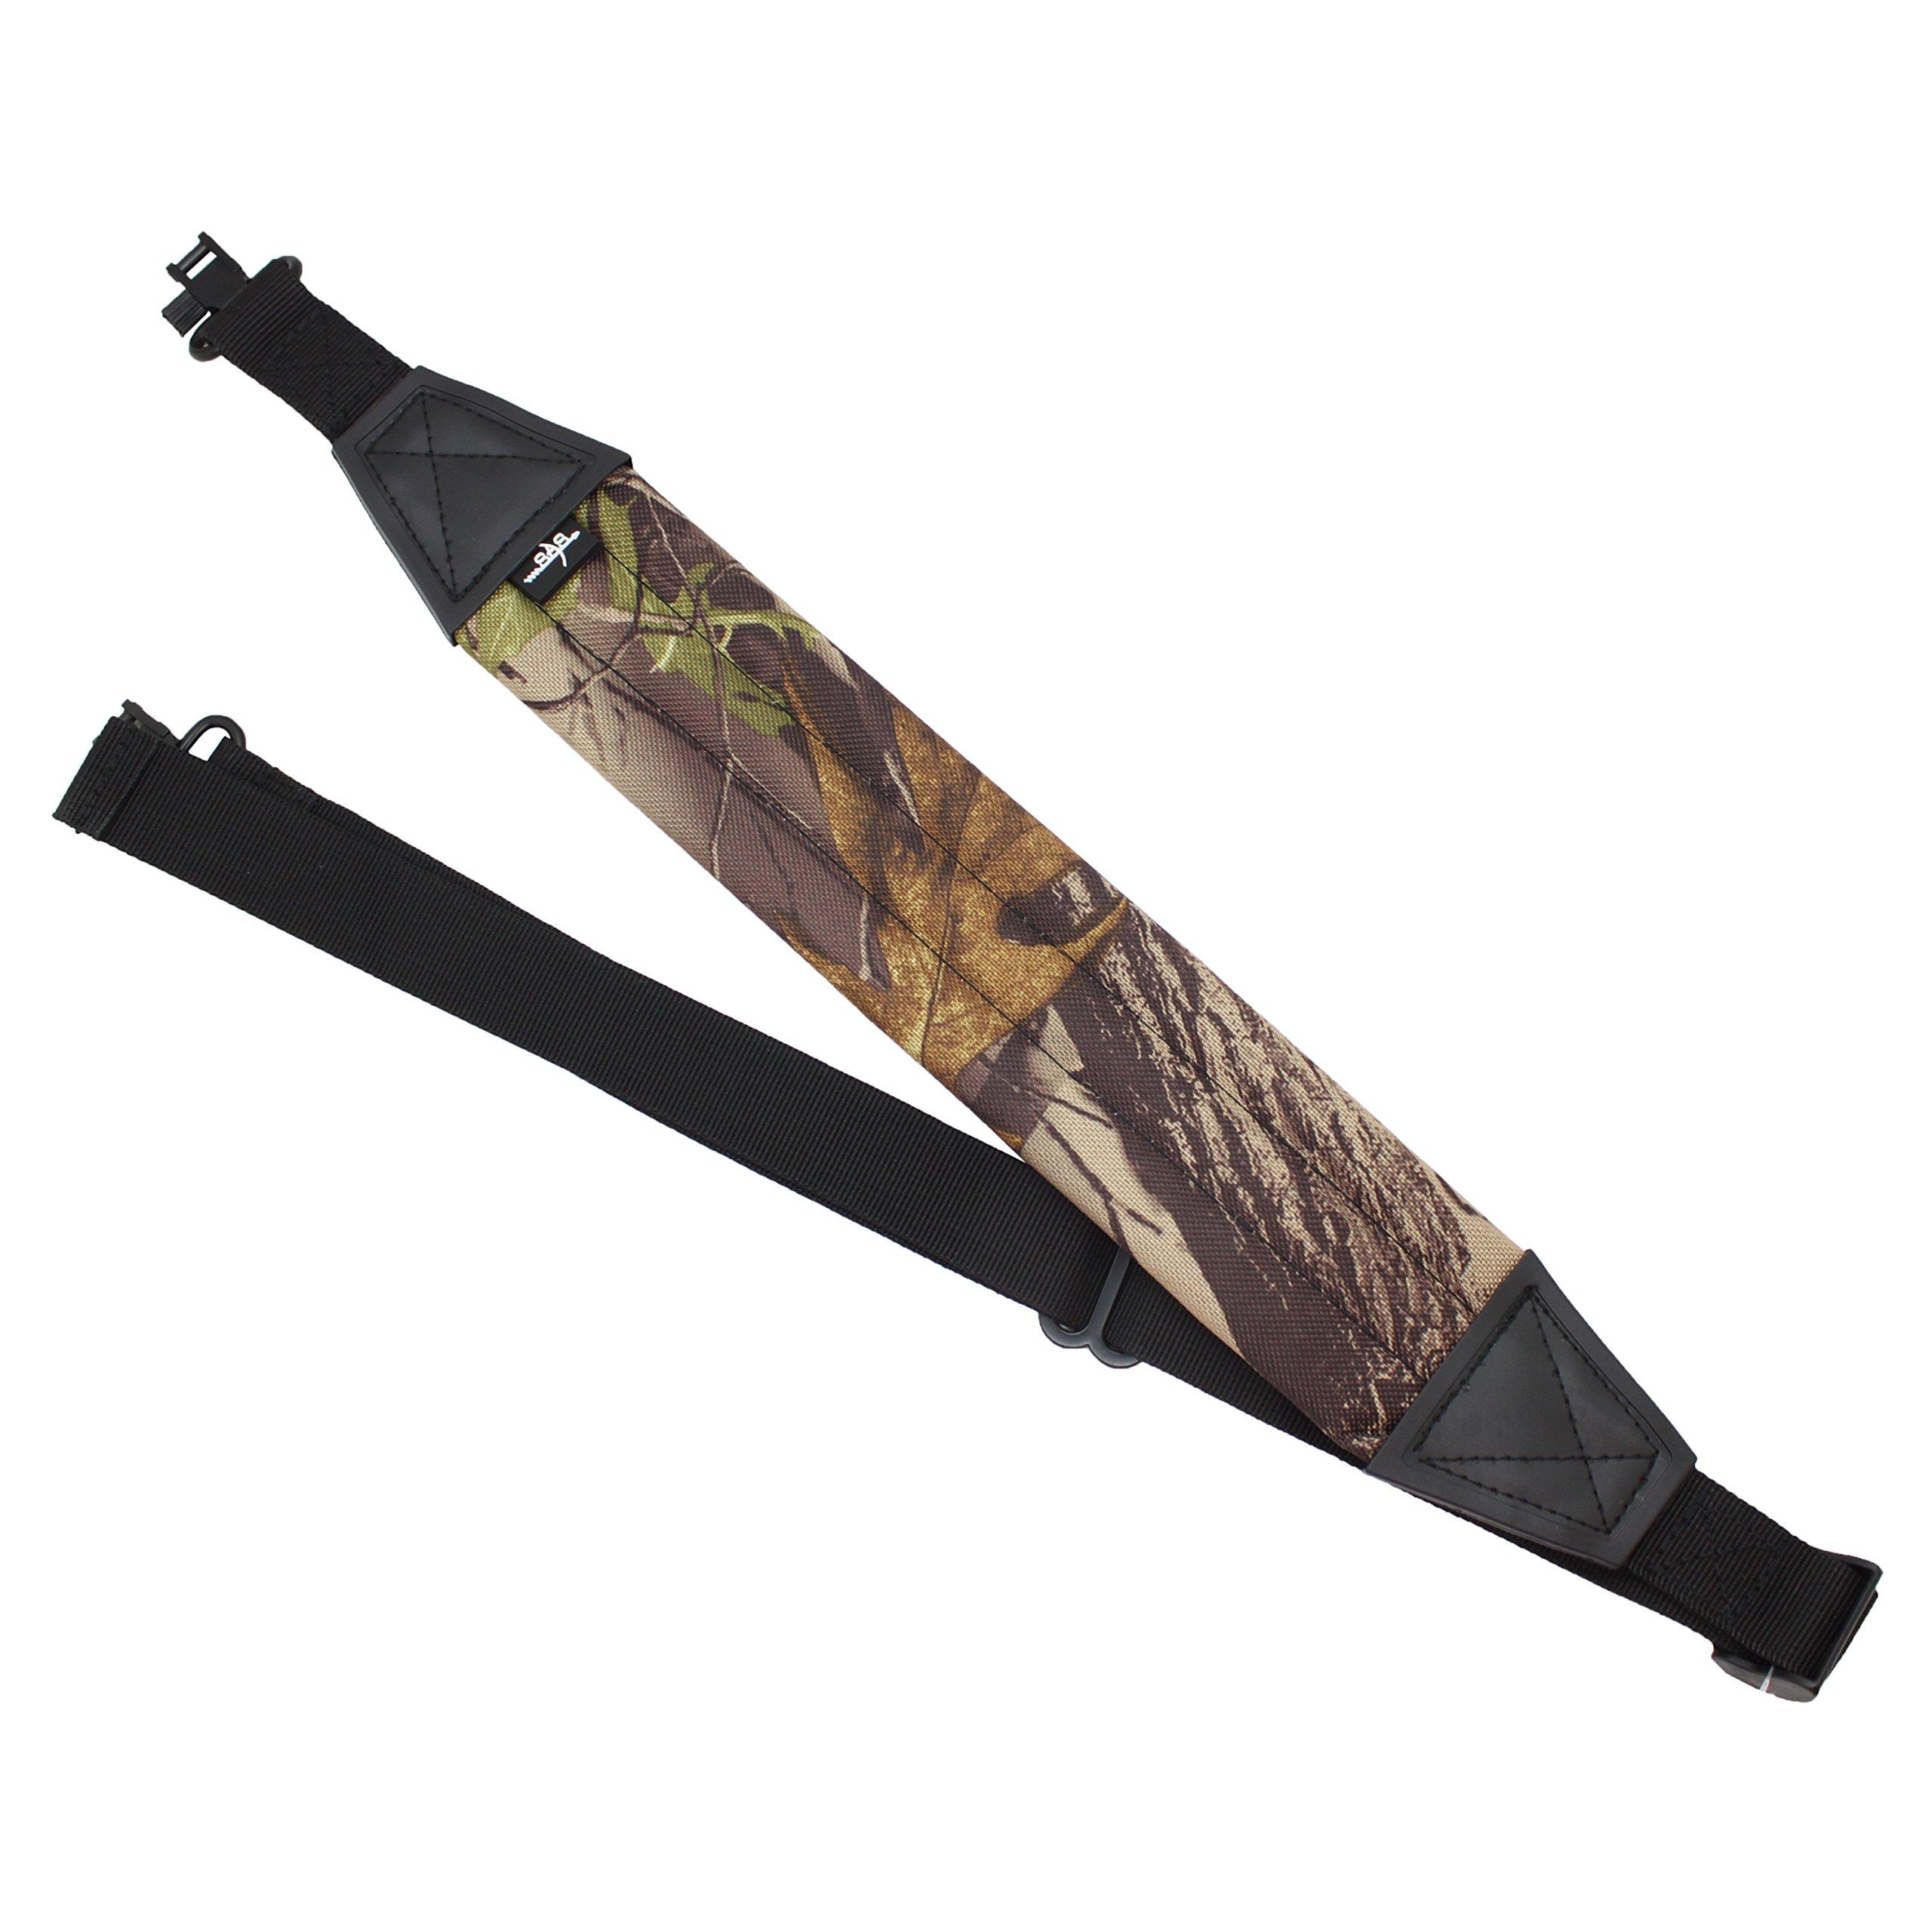 Southland Archery Universal Black Padded Crossbow Sling (Camo) by Southland Archery Supply